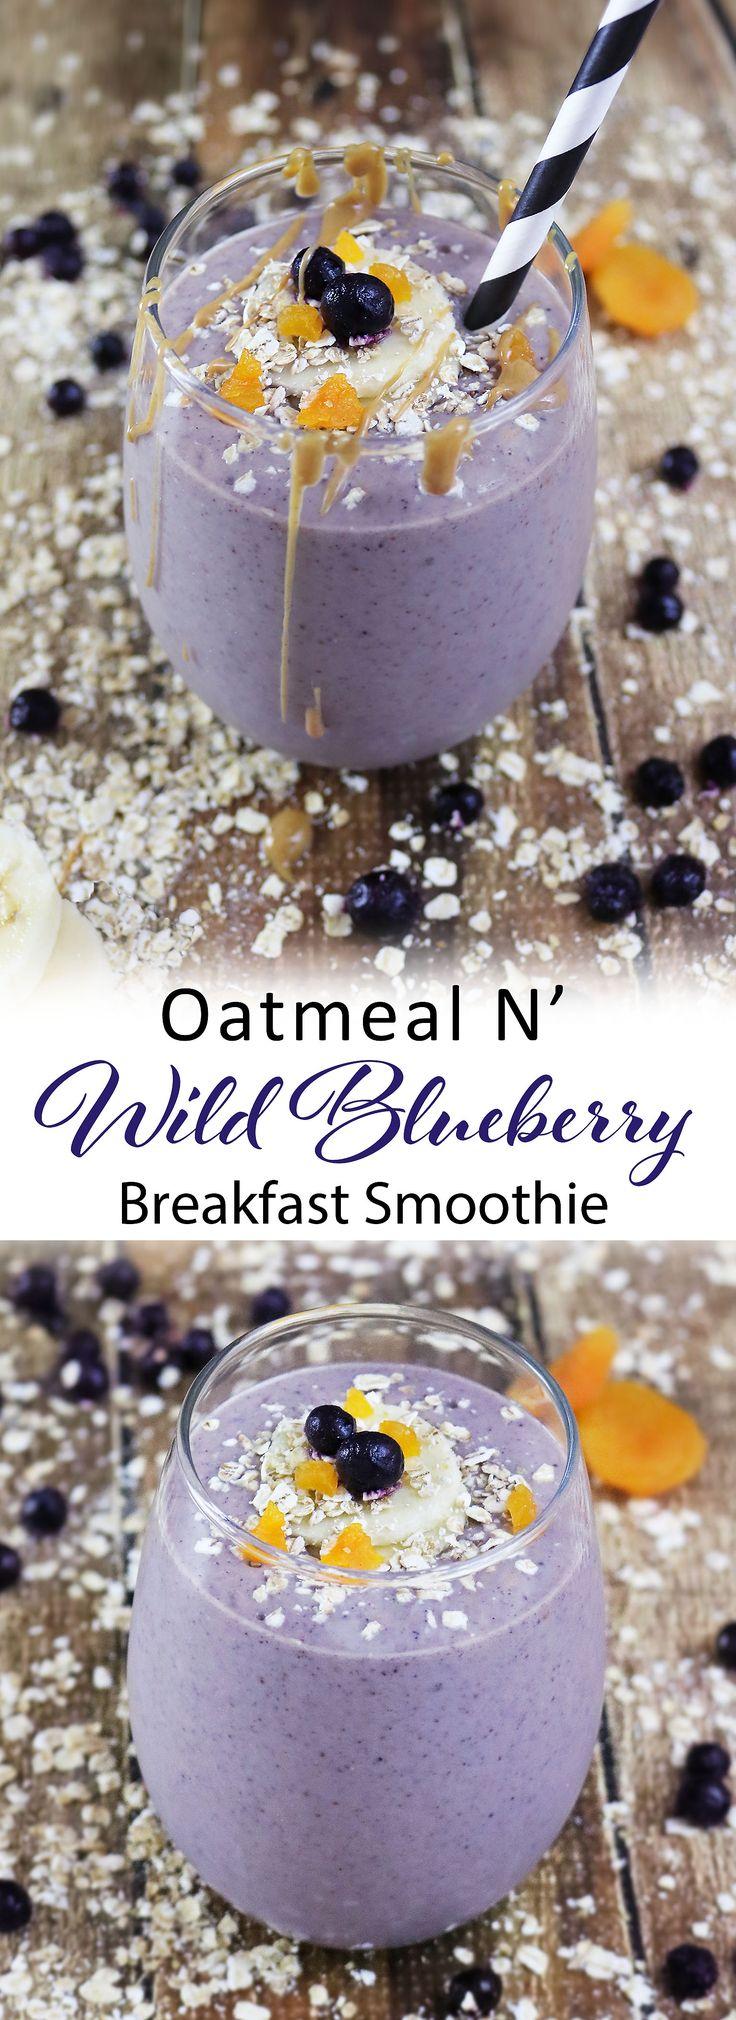 Oatmeal Wild Blueberry Breakfast Smoothie #ad #WildYourSmoothie